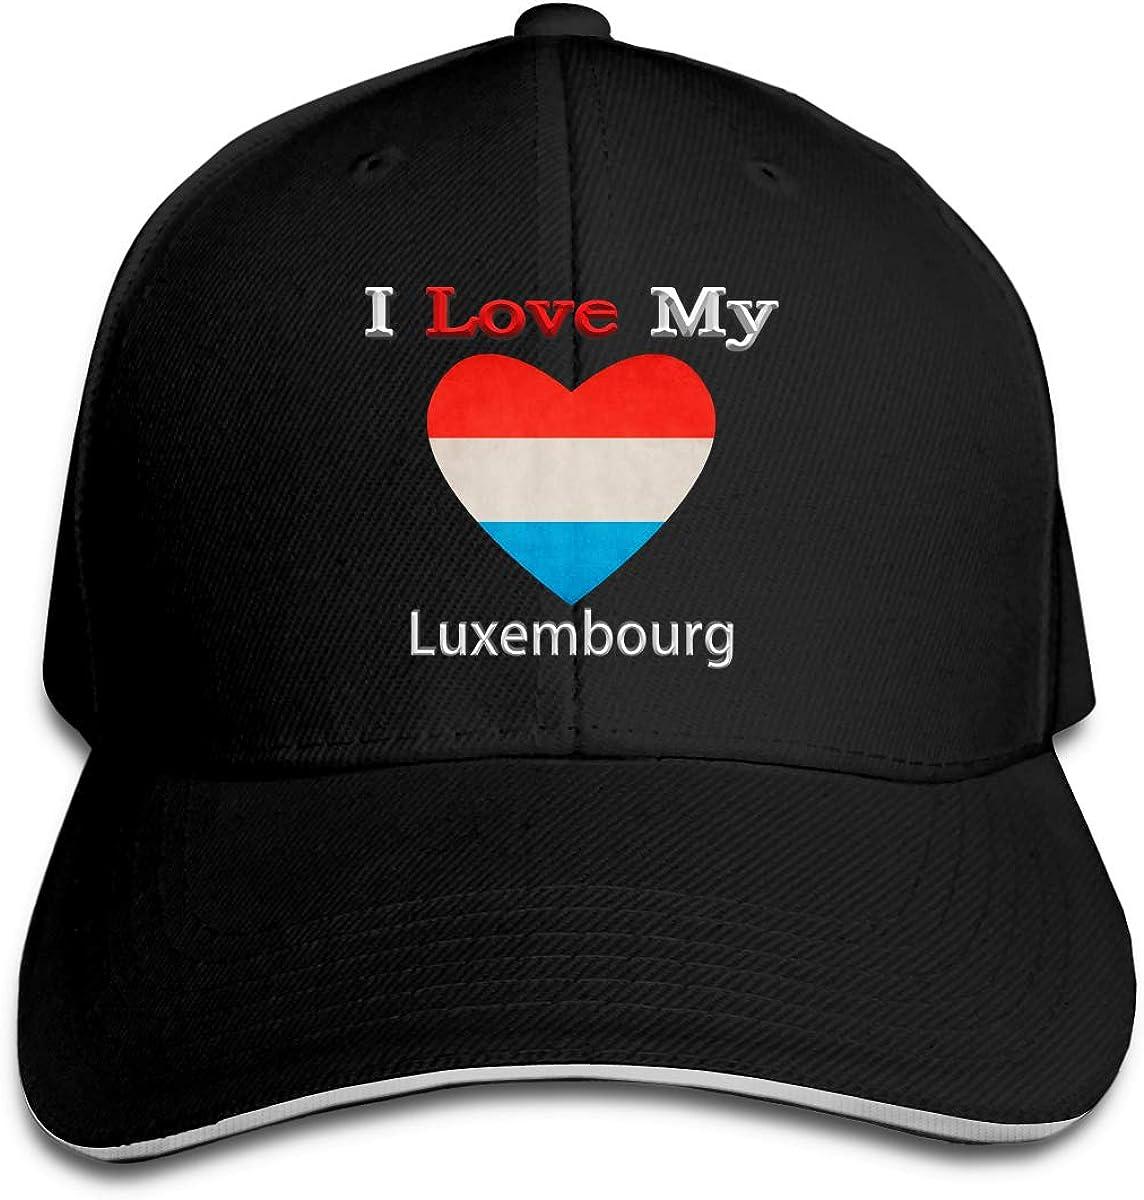 I Love My Flag of Luxembourg Heart Hat Baseball Cap Duck Tongue Cap Sunhat Fashion Cap